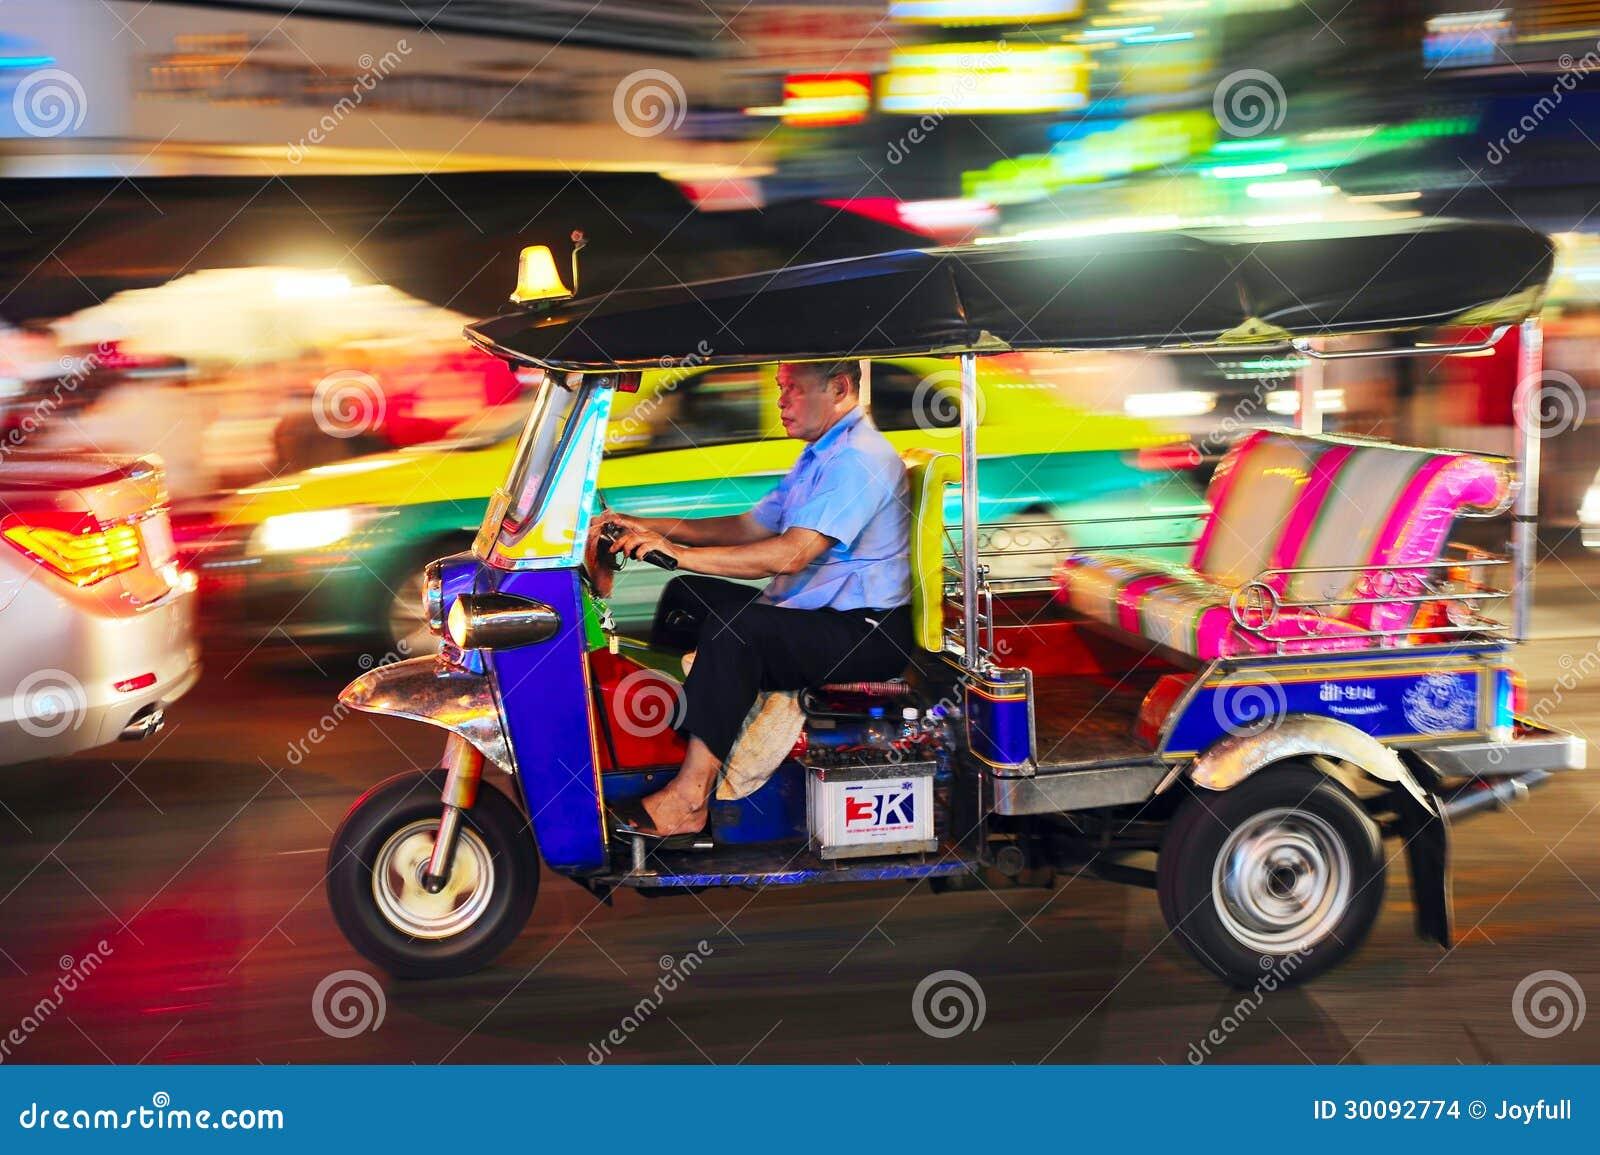 bangkok taxi editorial stock image image of ride capital 30092774. Black Bedroom Furniture Sets. Home Design Ideas